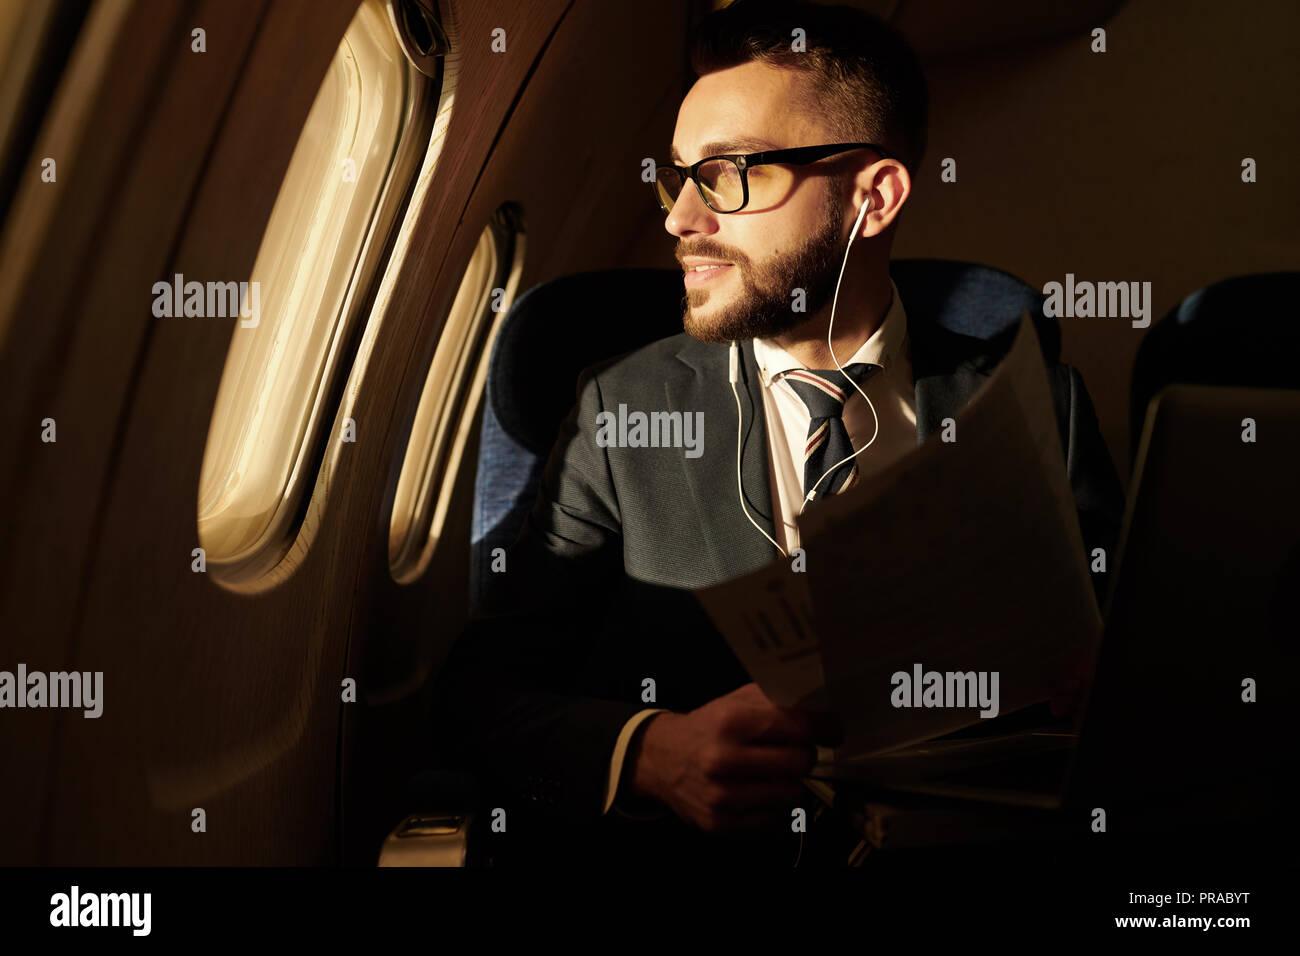 Businessman Enjoying Flight - Stock Image